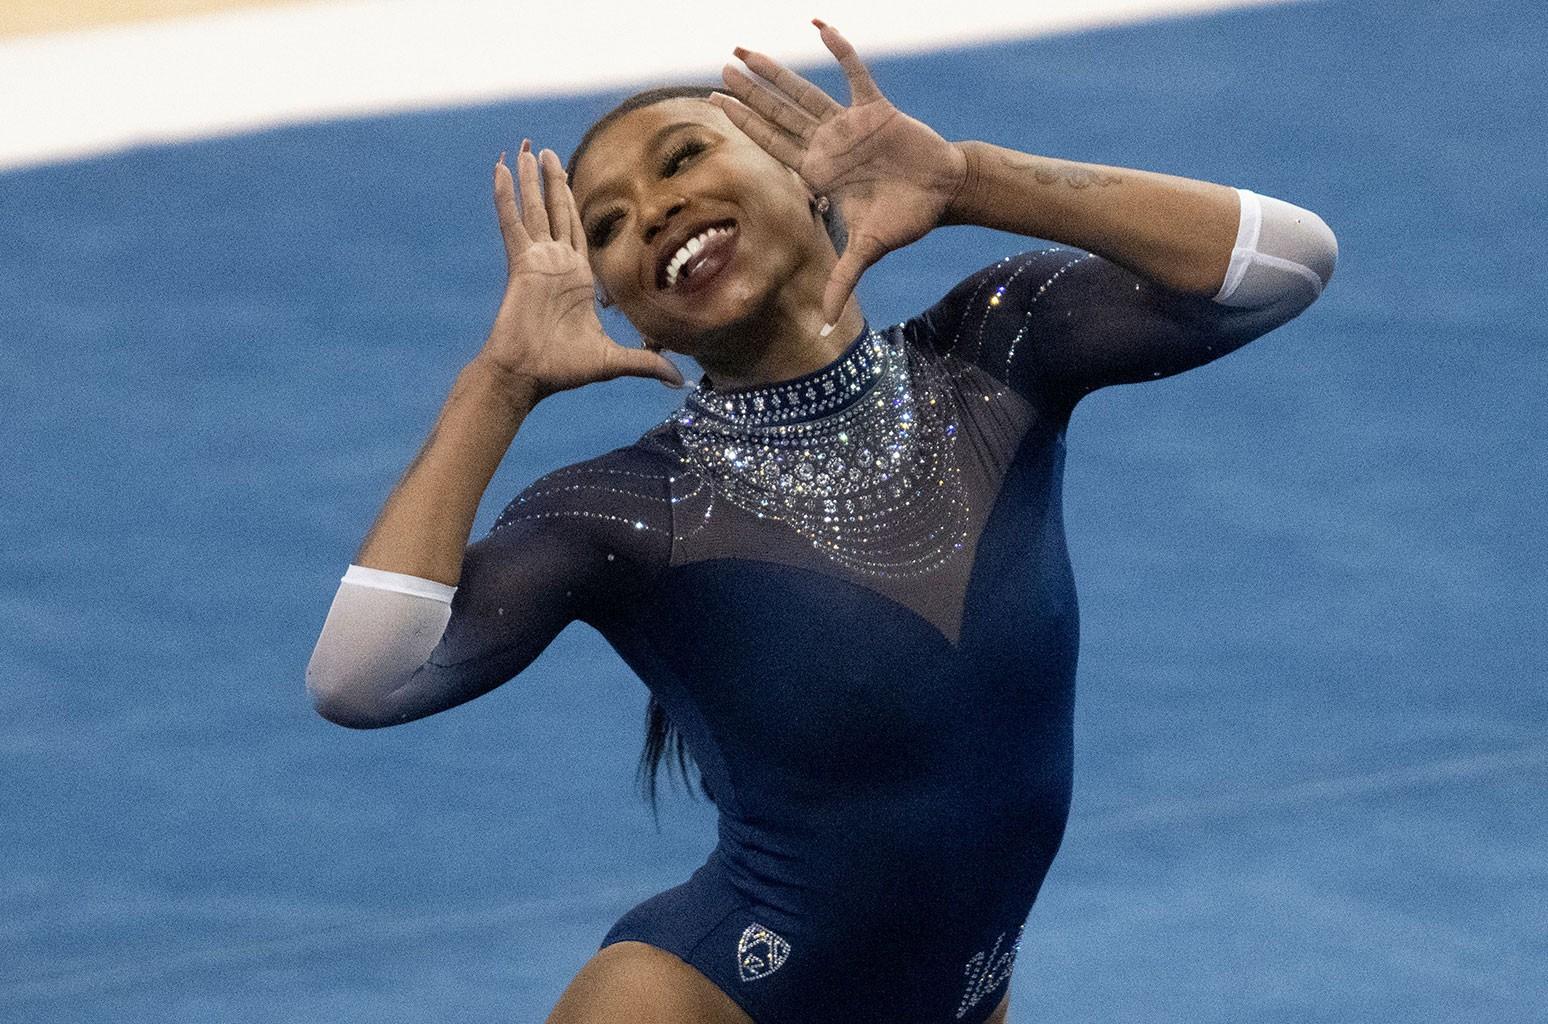 Missy Elliott Is Loving This UCLA Gymnast's 'Snappin' Floor Routine